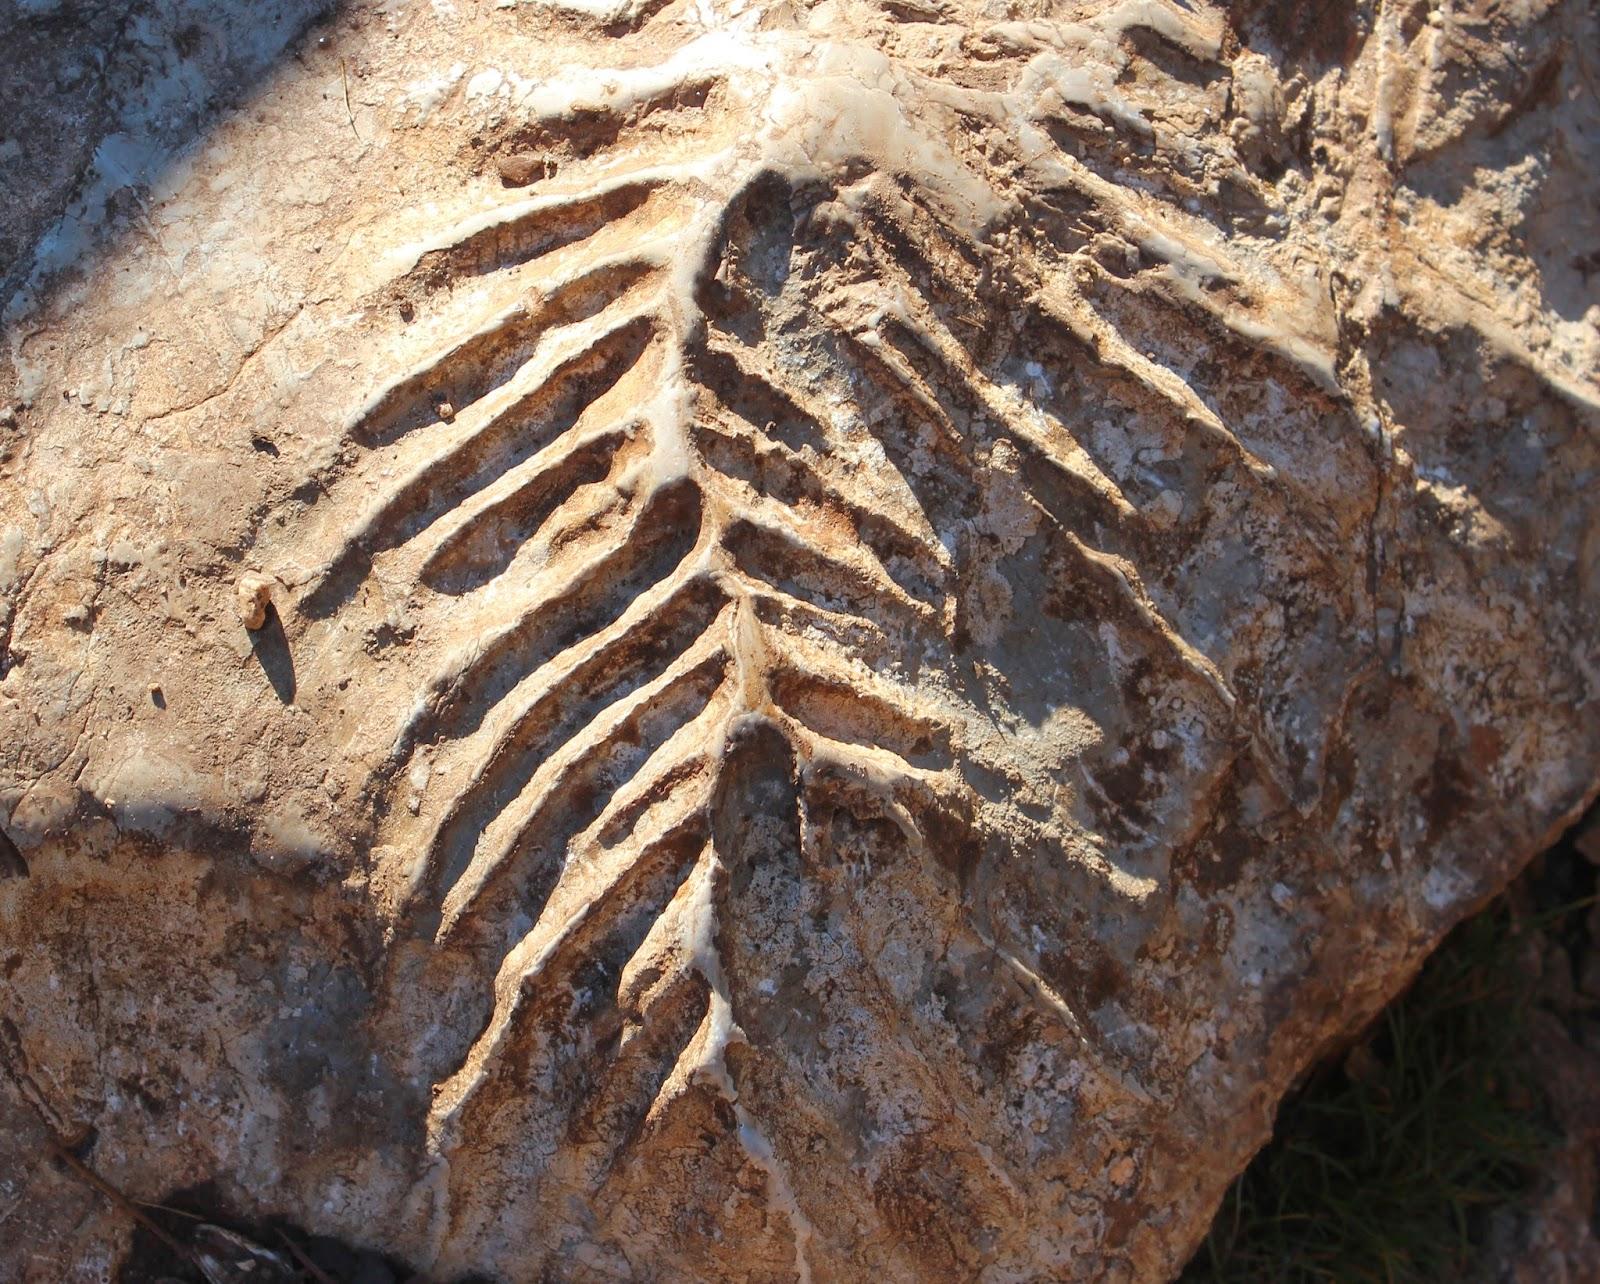 Fósiles marinos en la Sierra de Cazorla